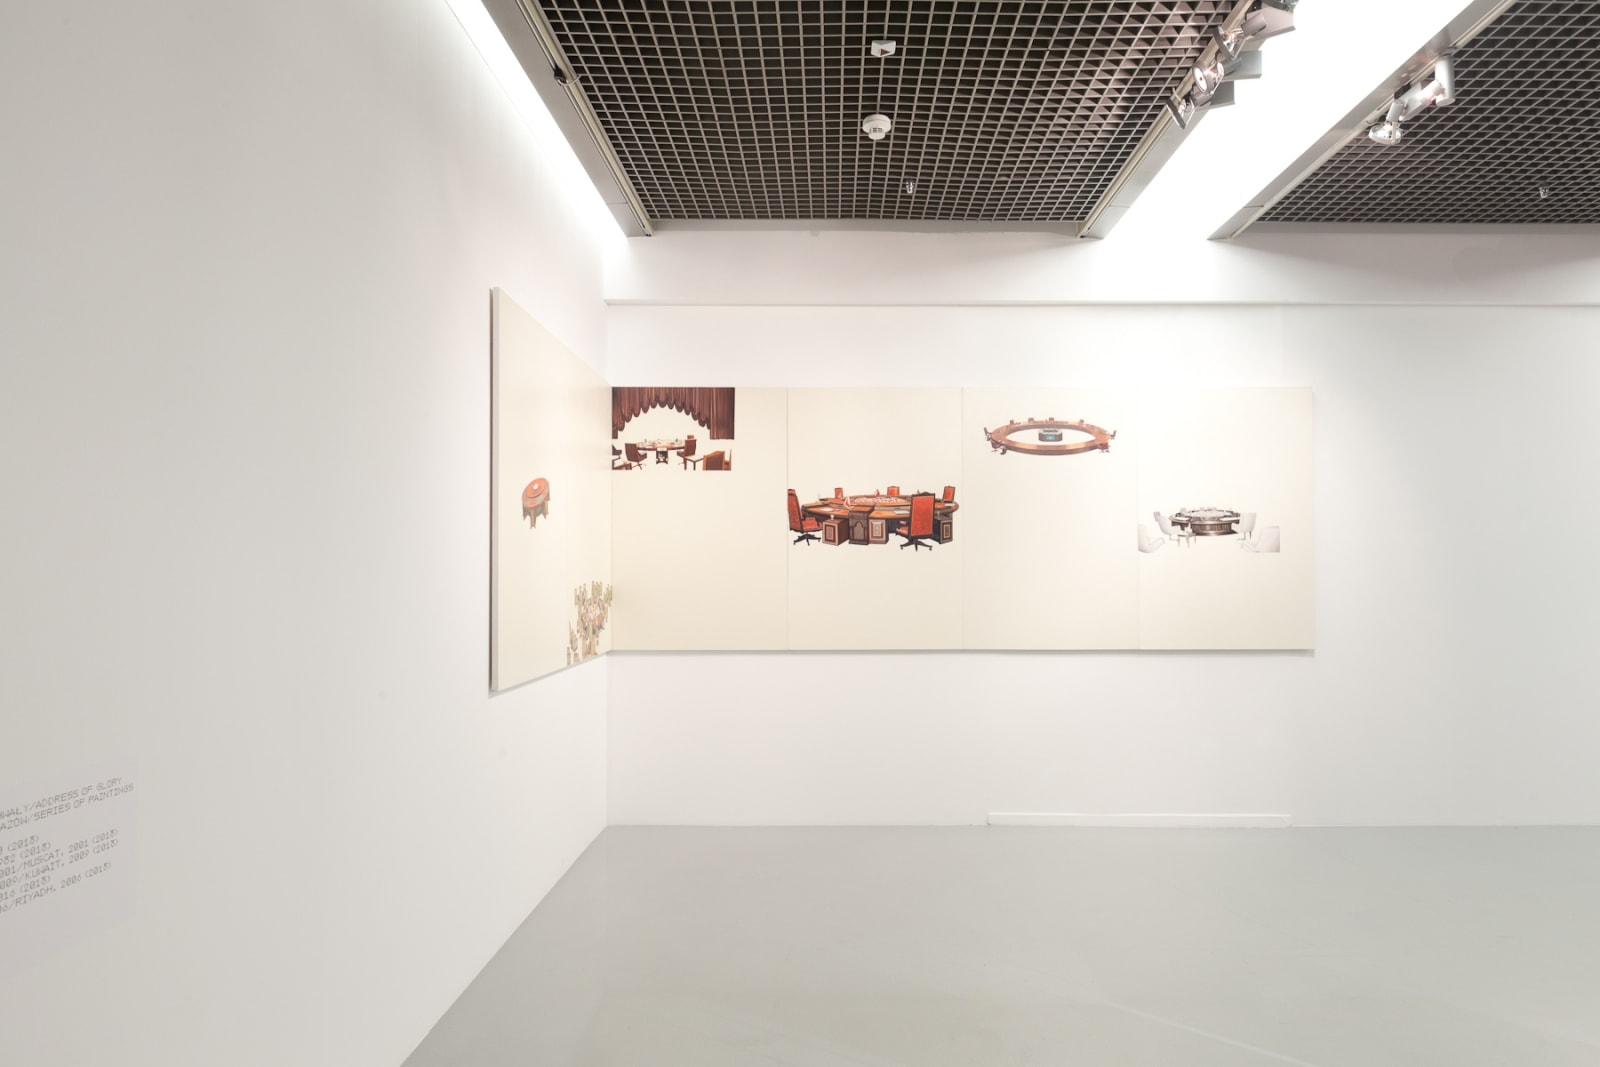 GCC exhibition view, Peer to Peer - Collective Practices in Art , Muzeum Sztuki, Łódź 2018